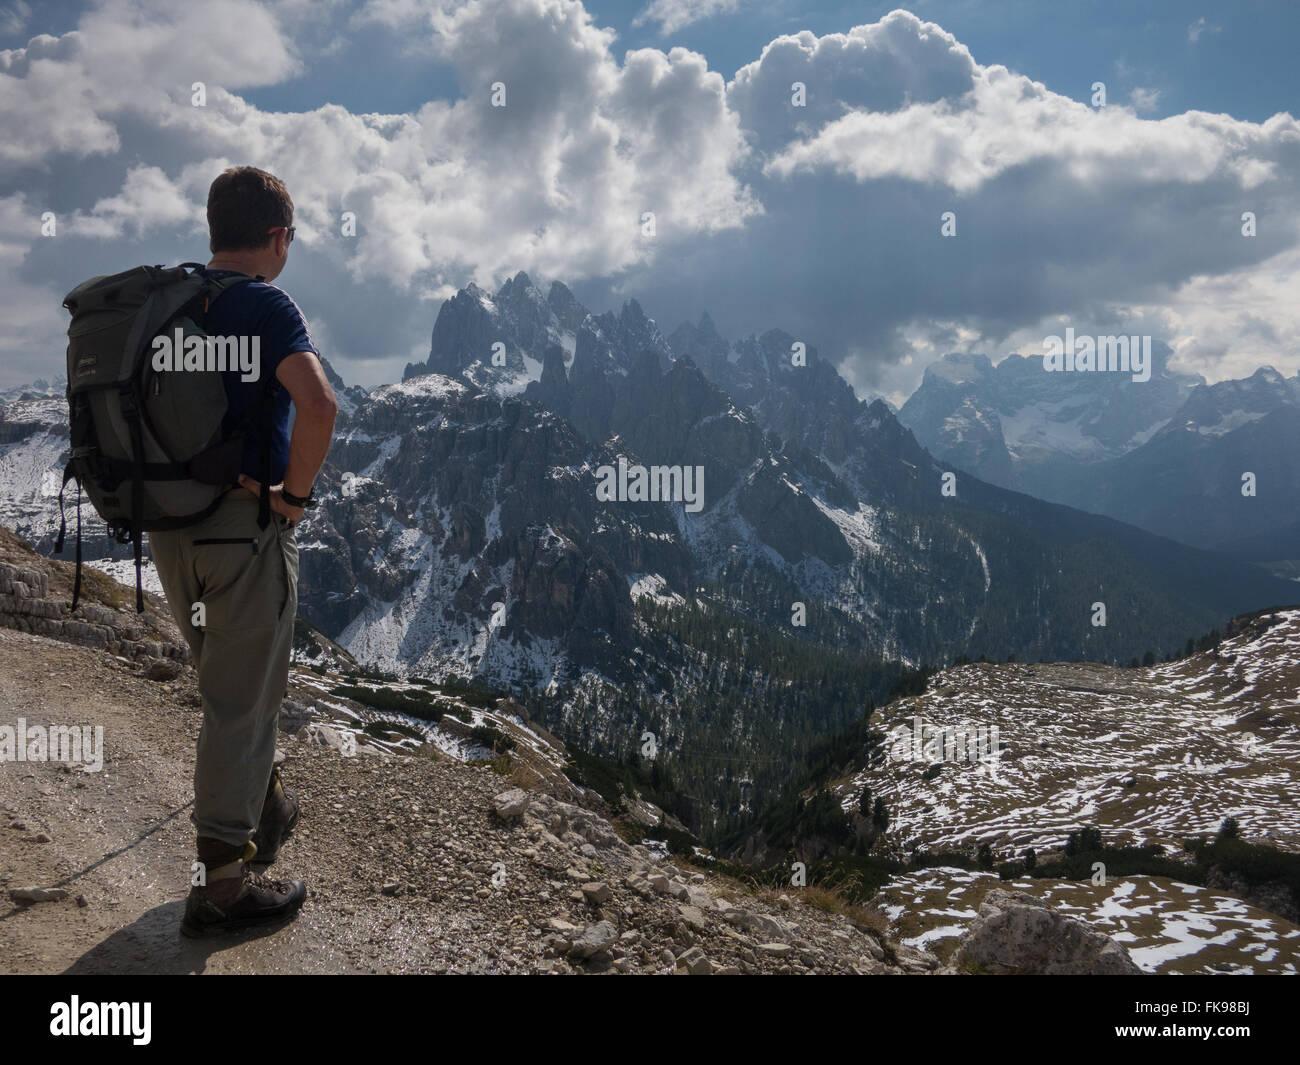 Trekking auf den Tre Cime Schaltung, Dolomiten, Provinz Belluno, Veneto, Italien Stockbild